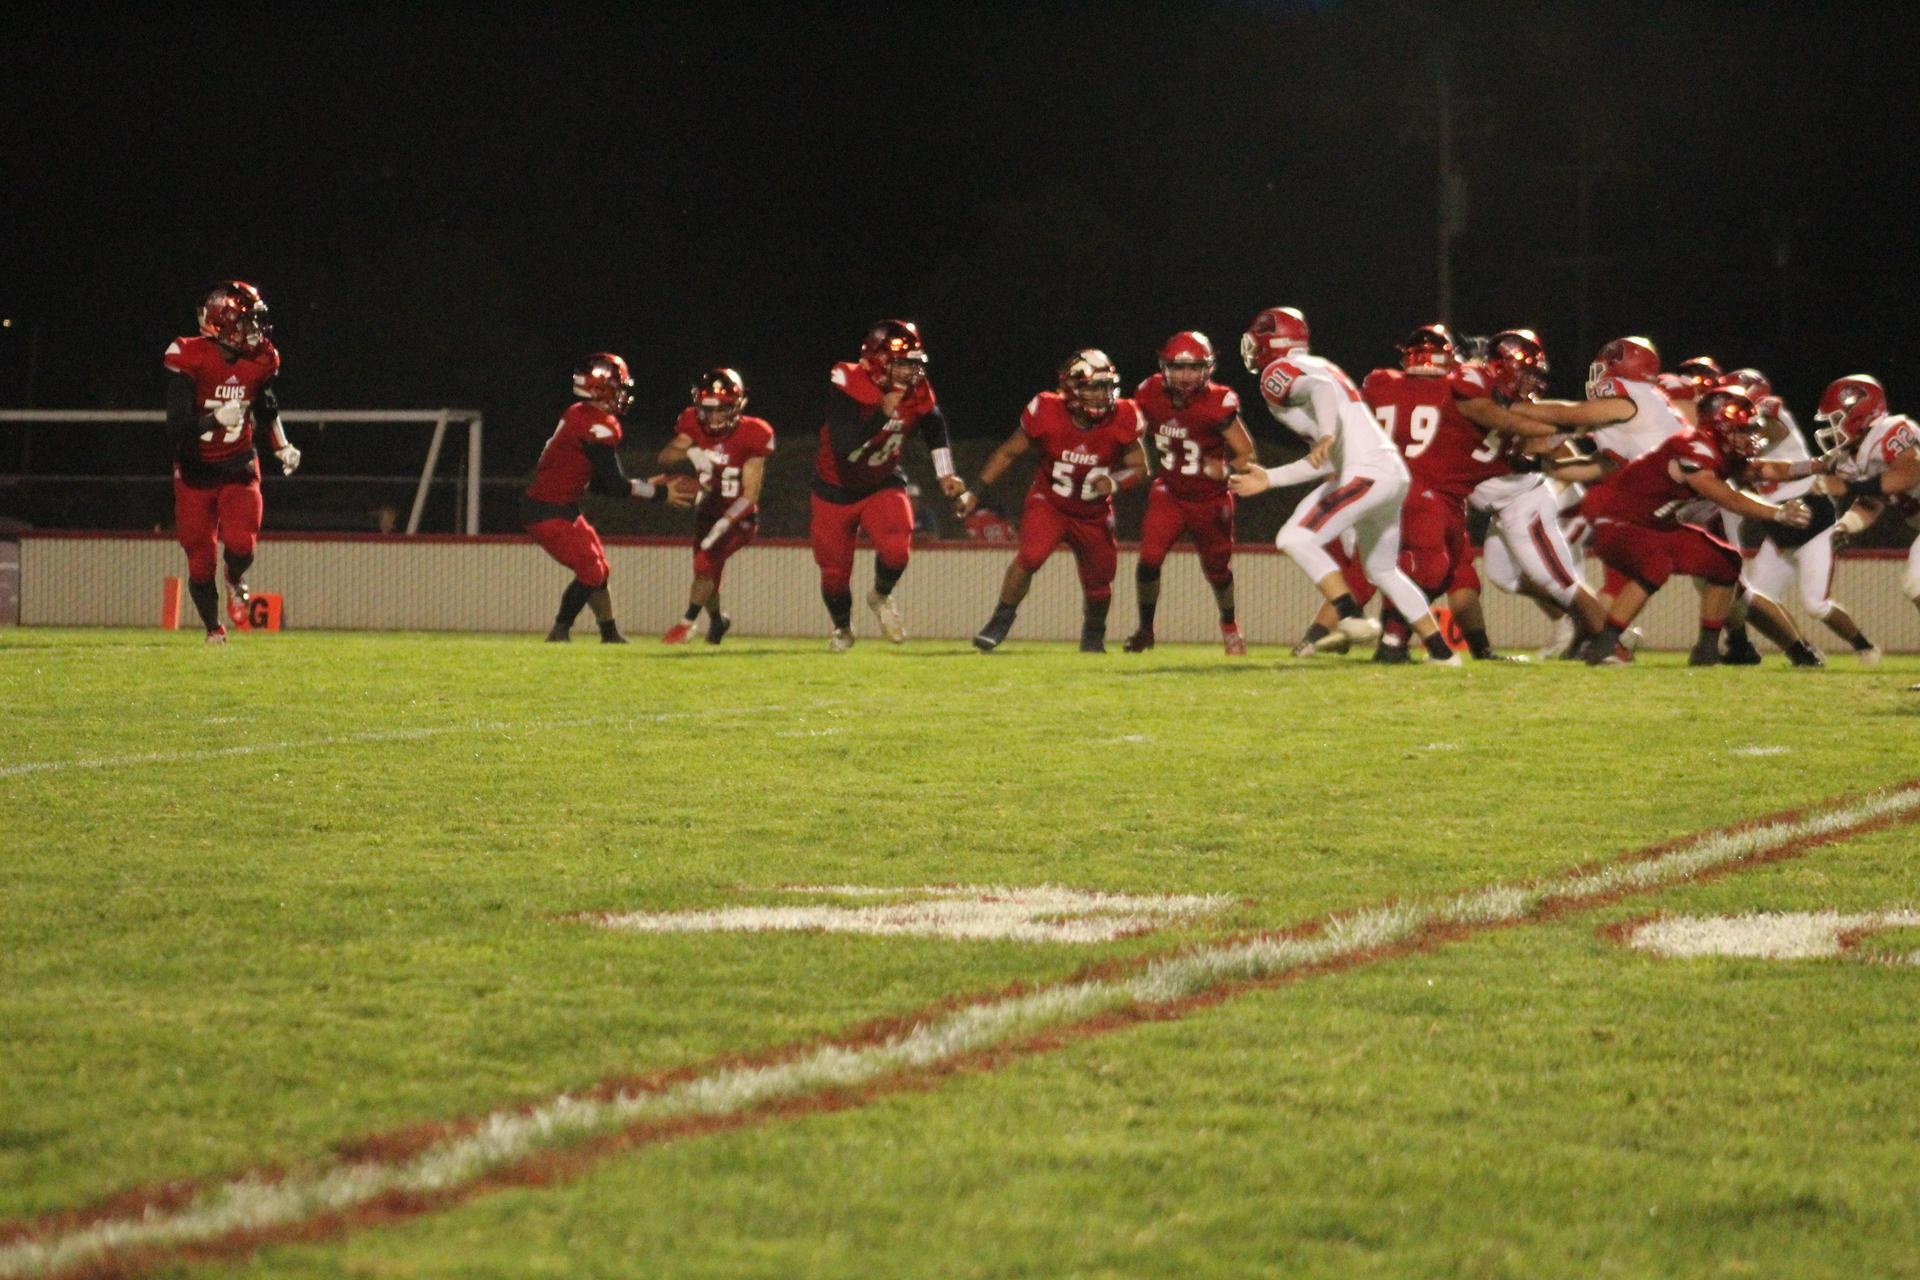 Varsity Boys playing Football against Kerman